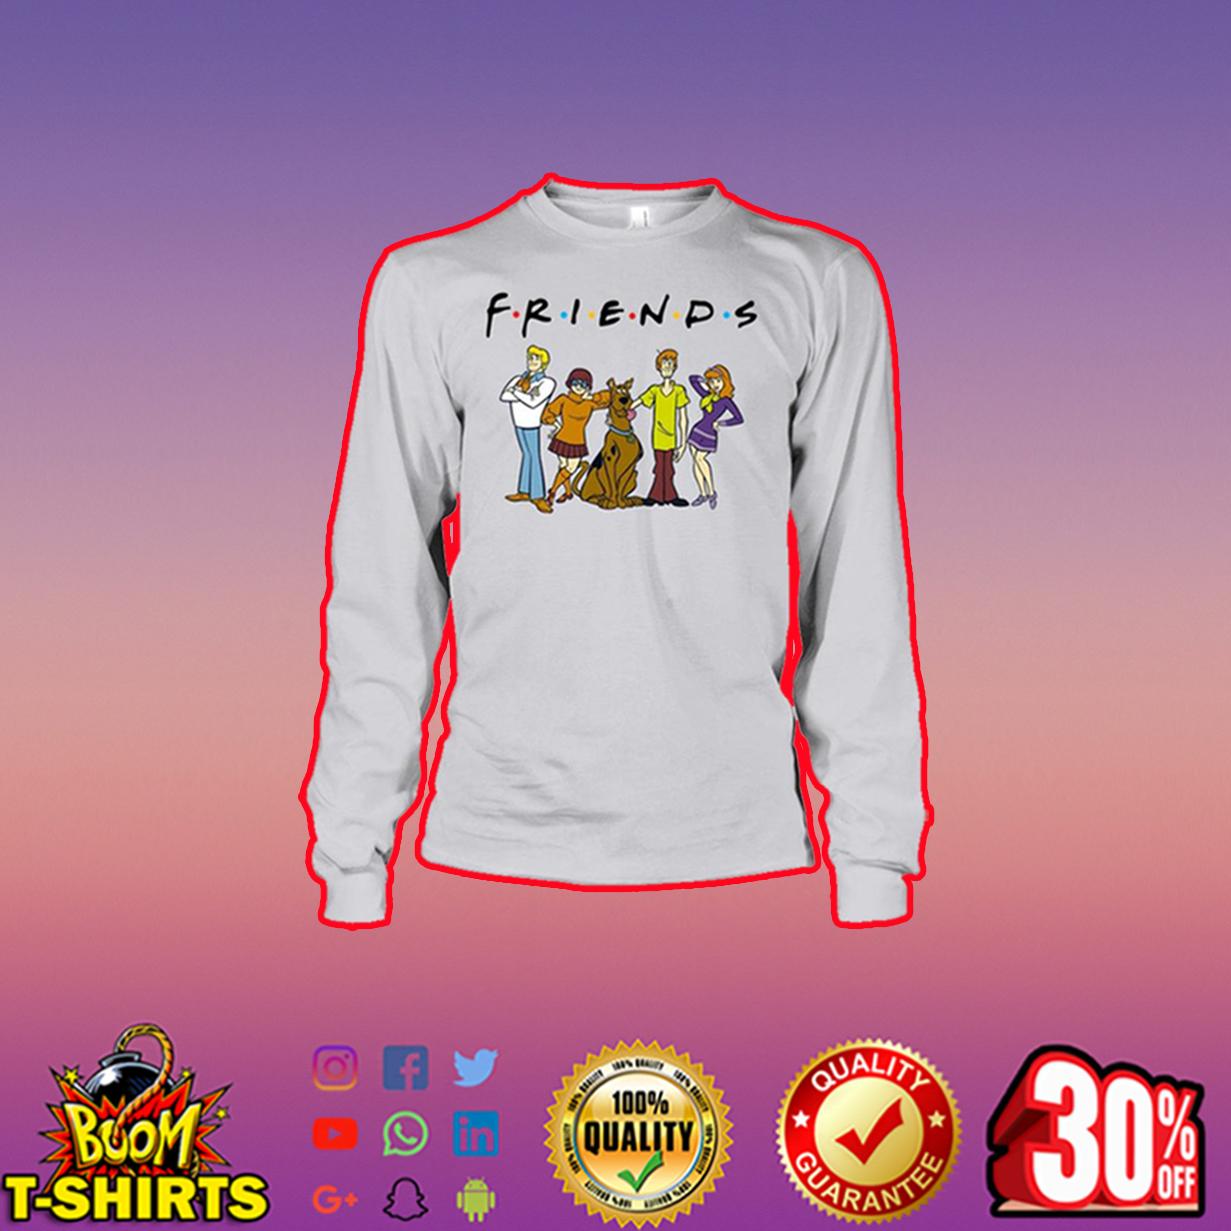 Scooby Doo Friends long sleeve tee